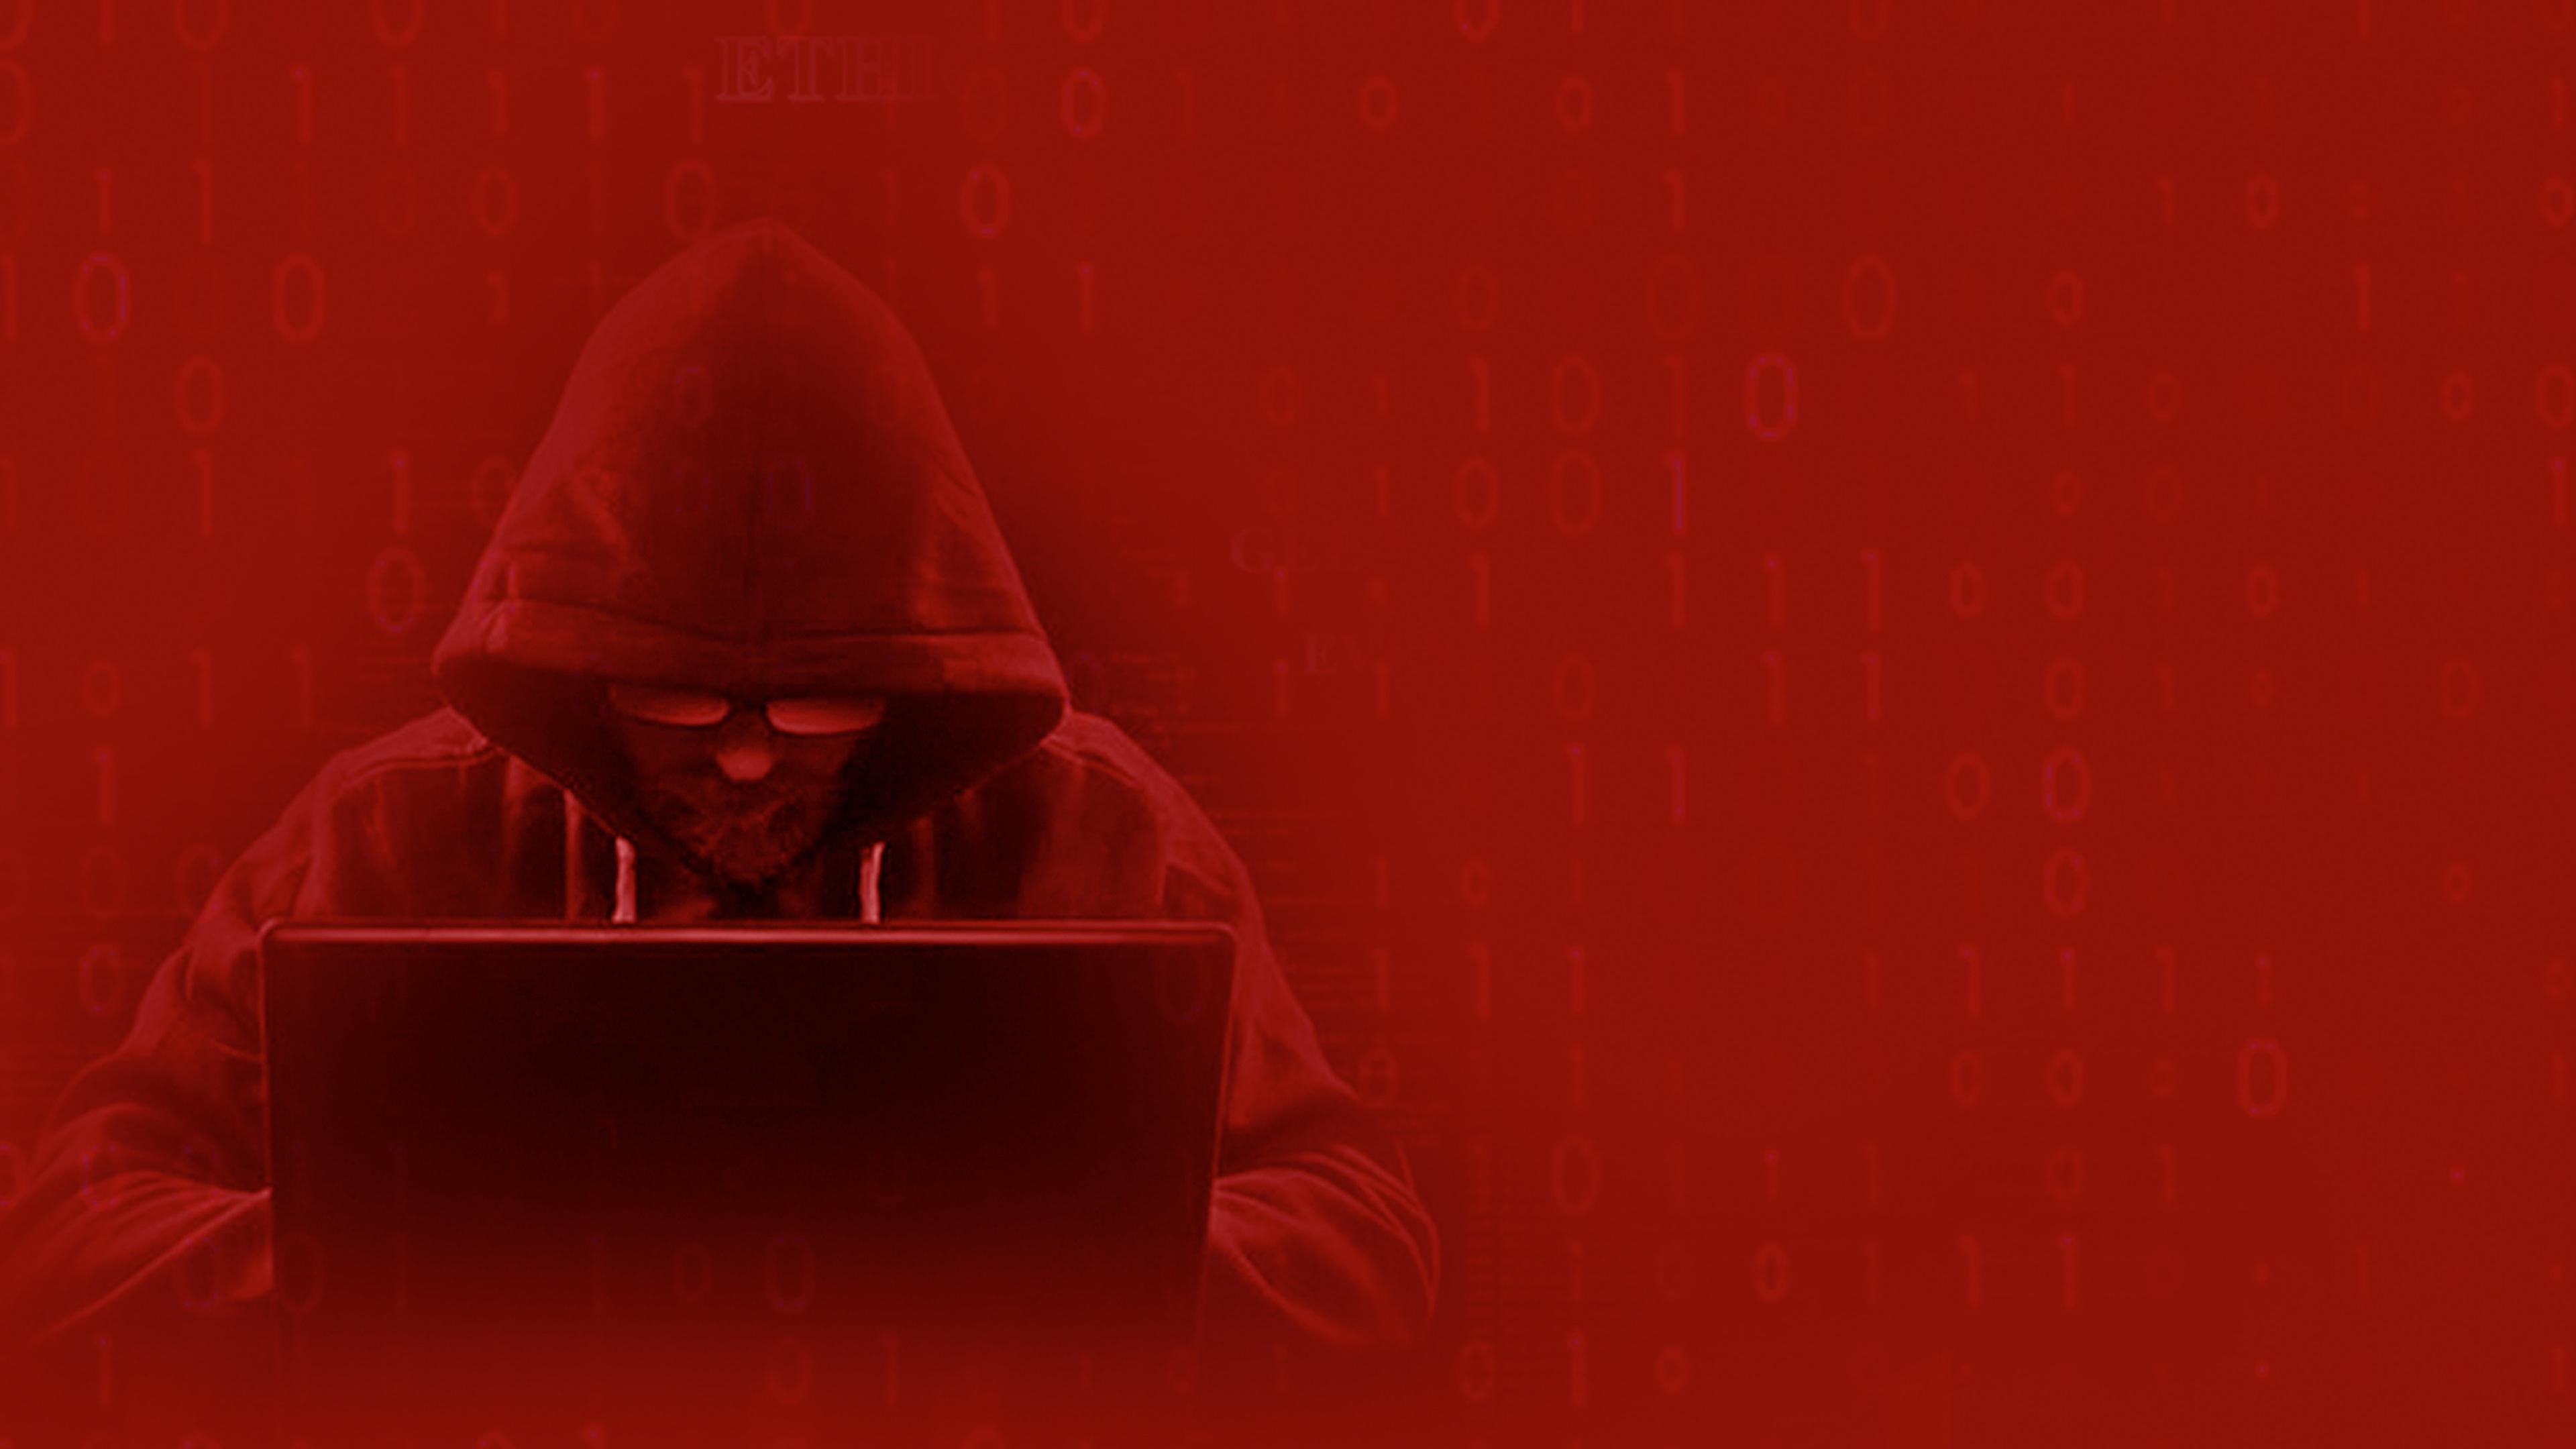 03 9005 7504 Scam ATO Robocalls For Tax Invasion